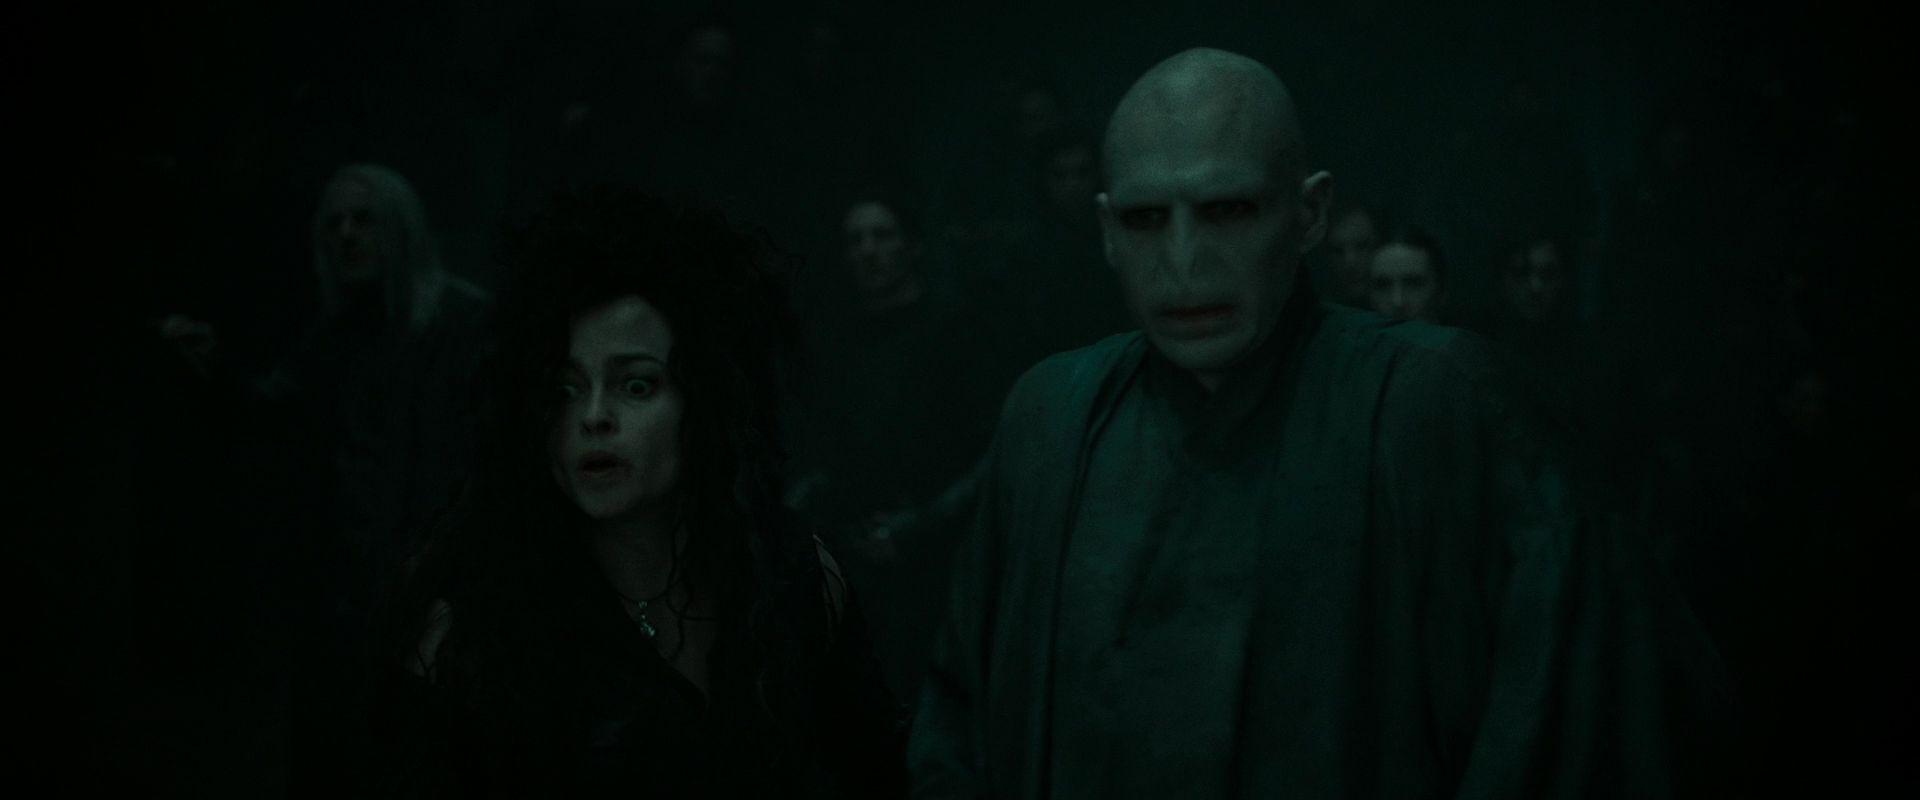 Les Mangemorts Images Harry Potter 7 Deathly Hallows Part 2 Hd